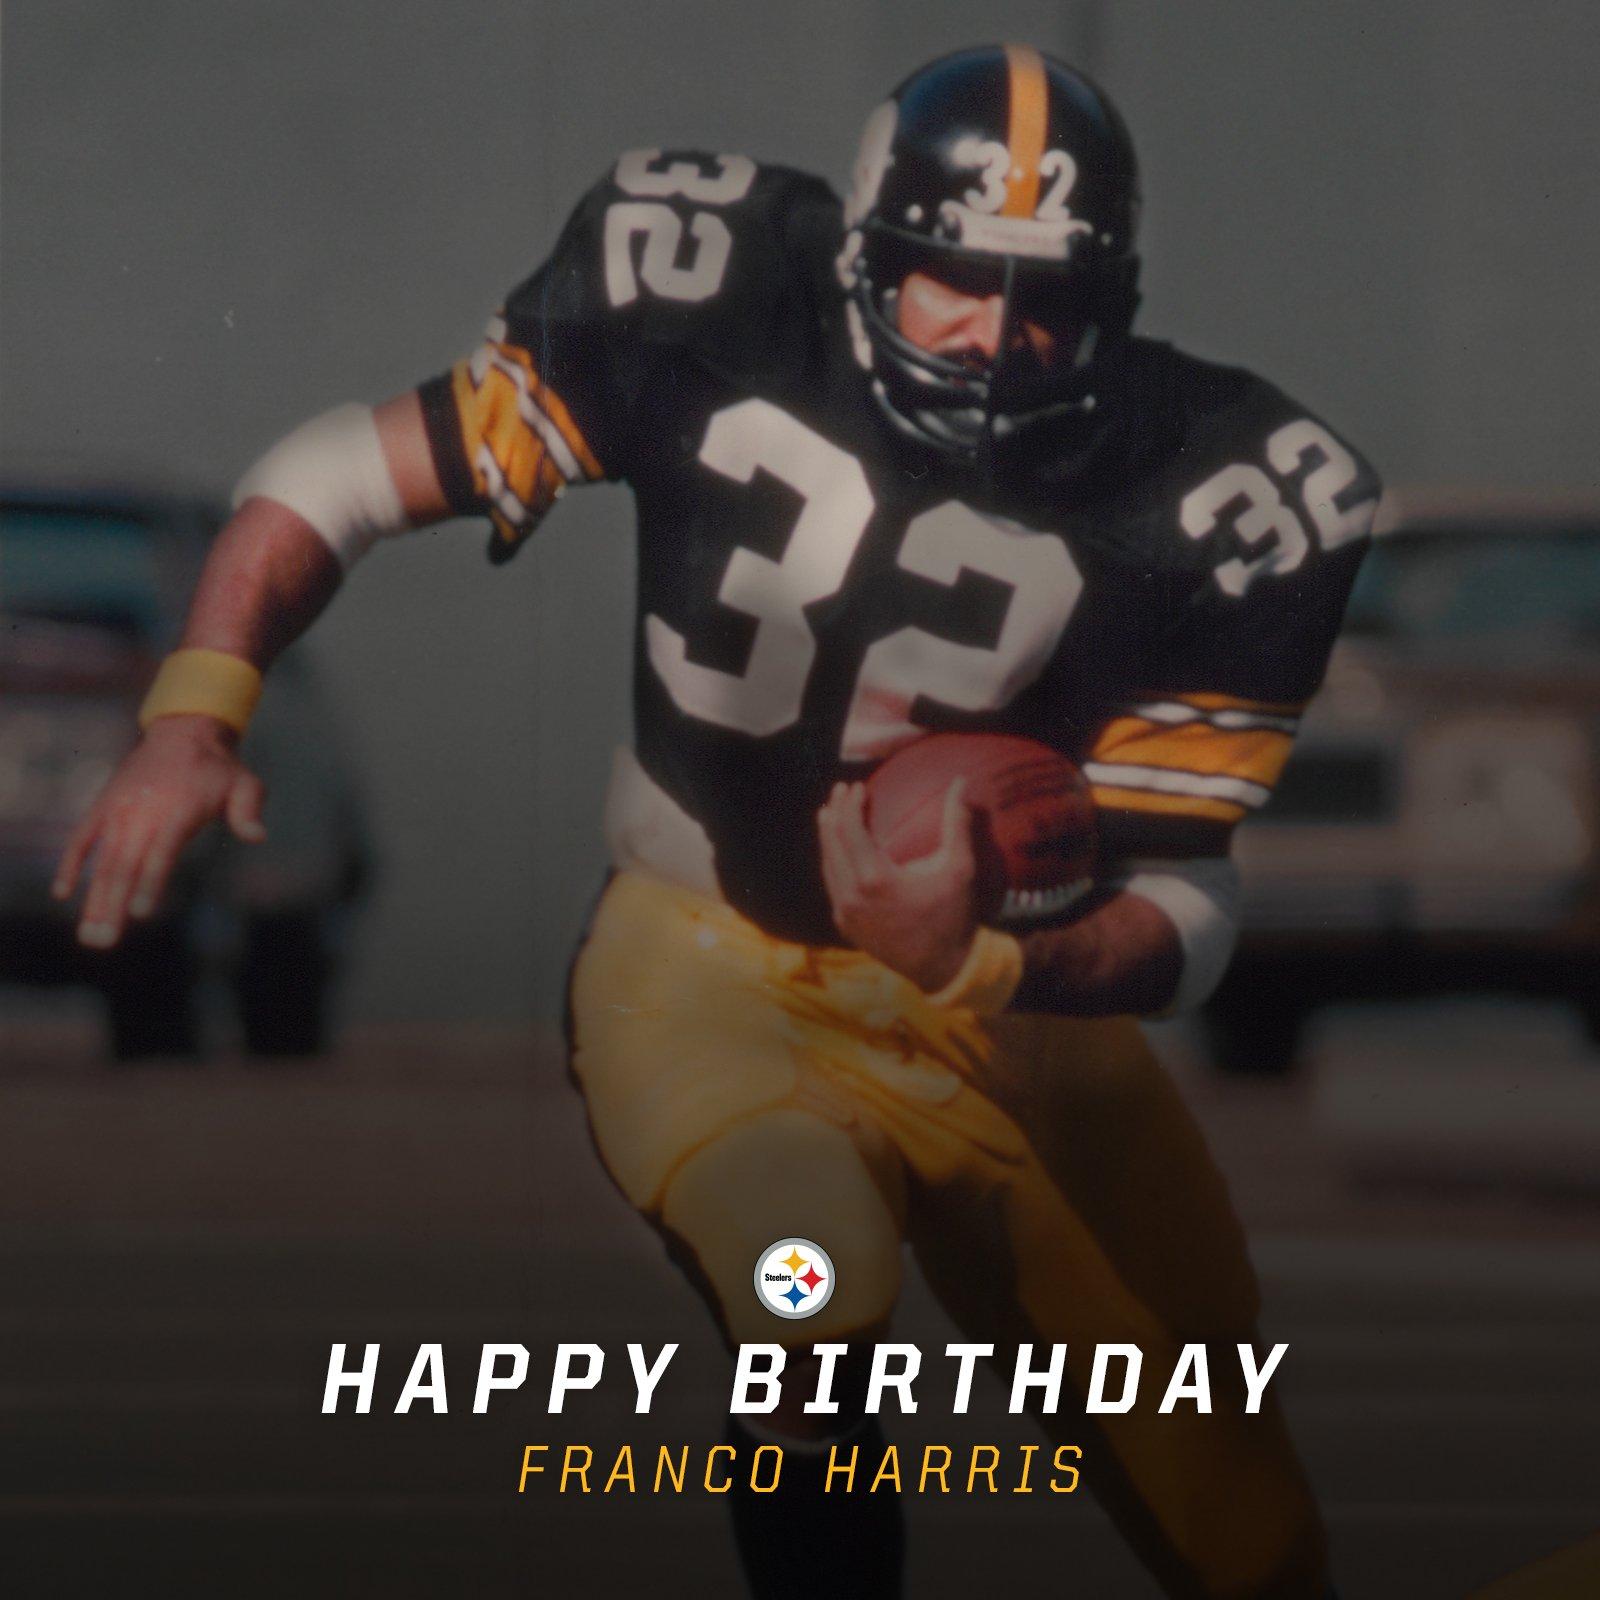 Have an immaculate birthday, @francoharrishof‼️  #HappyBirthday https://t.co/gYYxrESQX7